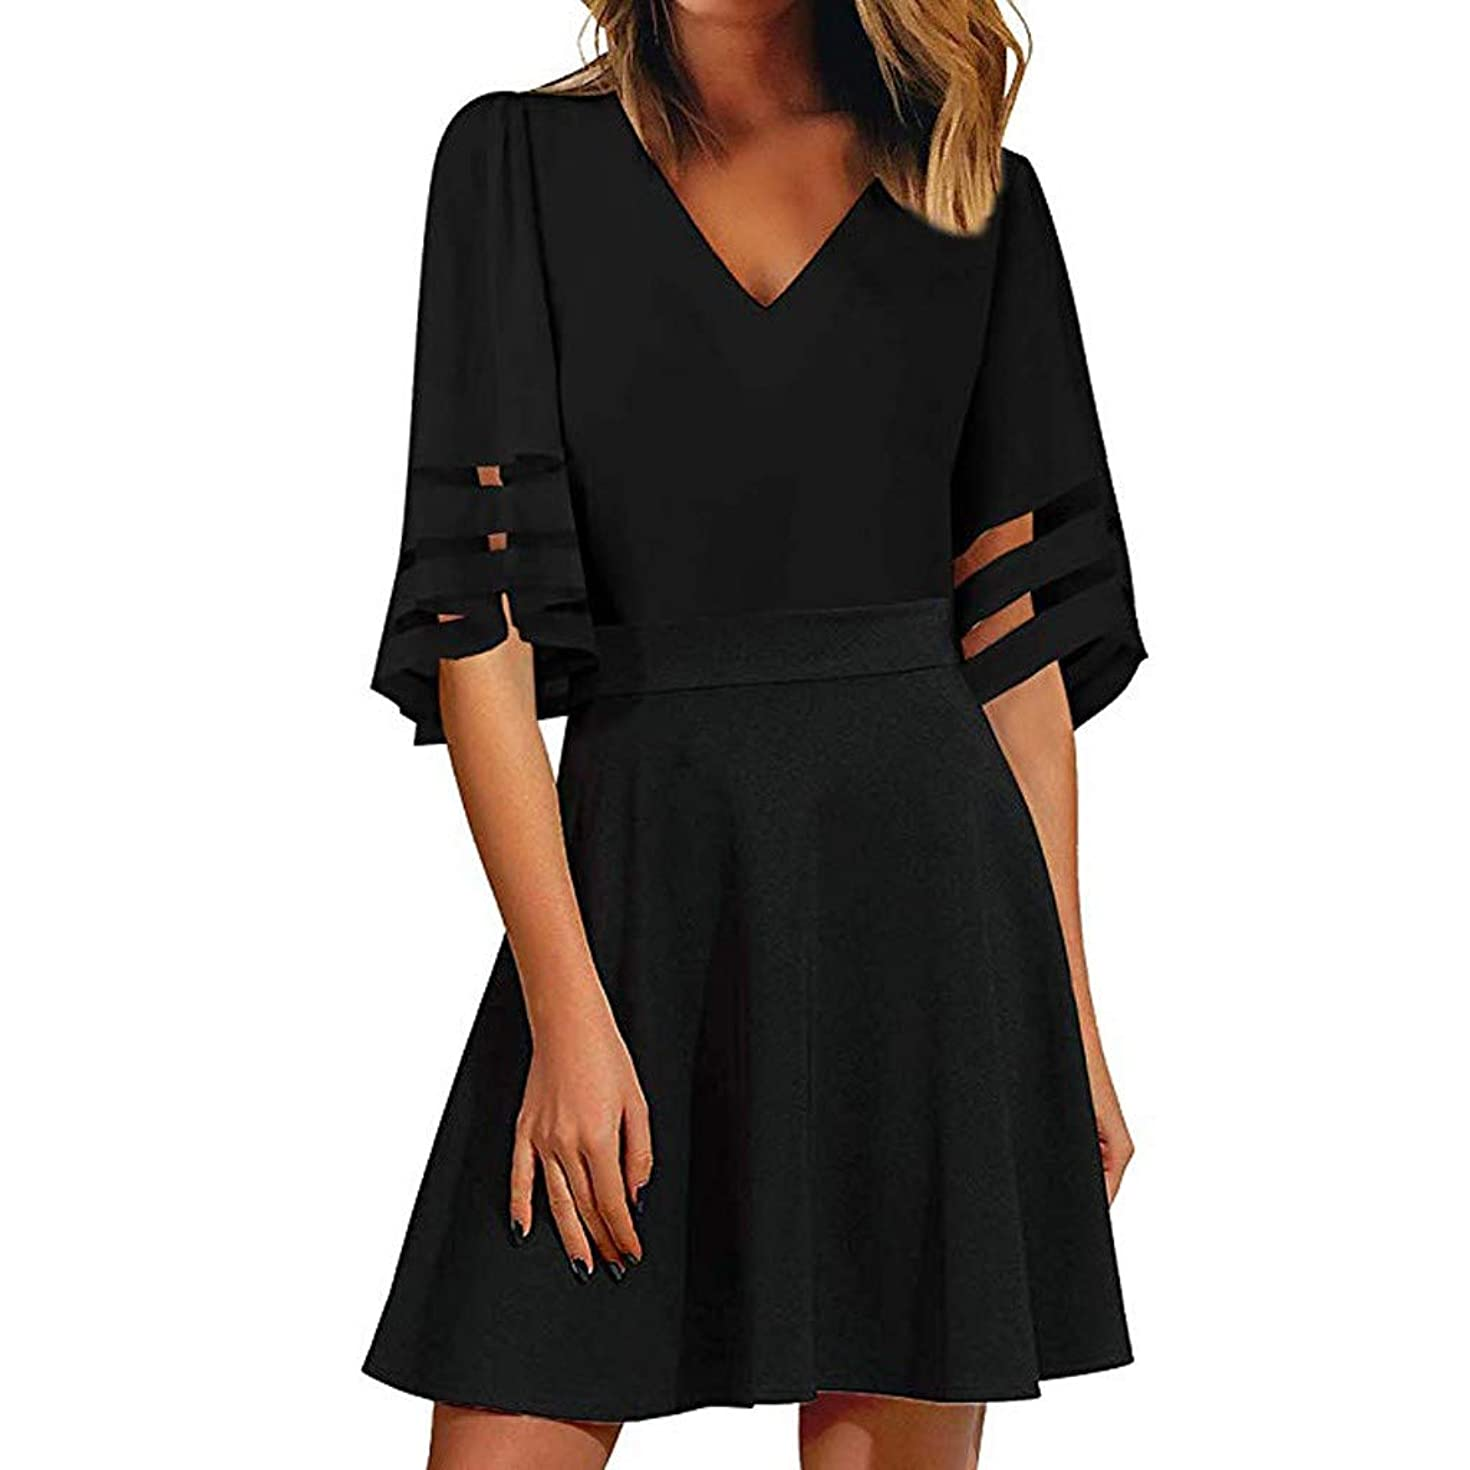 Nihewoo Womens Dresses Mesh Maxi Dress 3/4 Bell Sleeve V-Neck Flare Dress Loose Swing T-Shirt Dress Easter Dresses